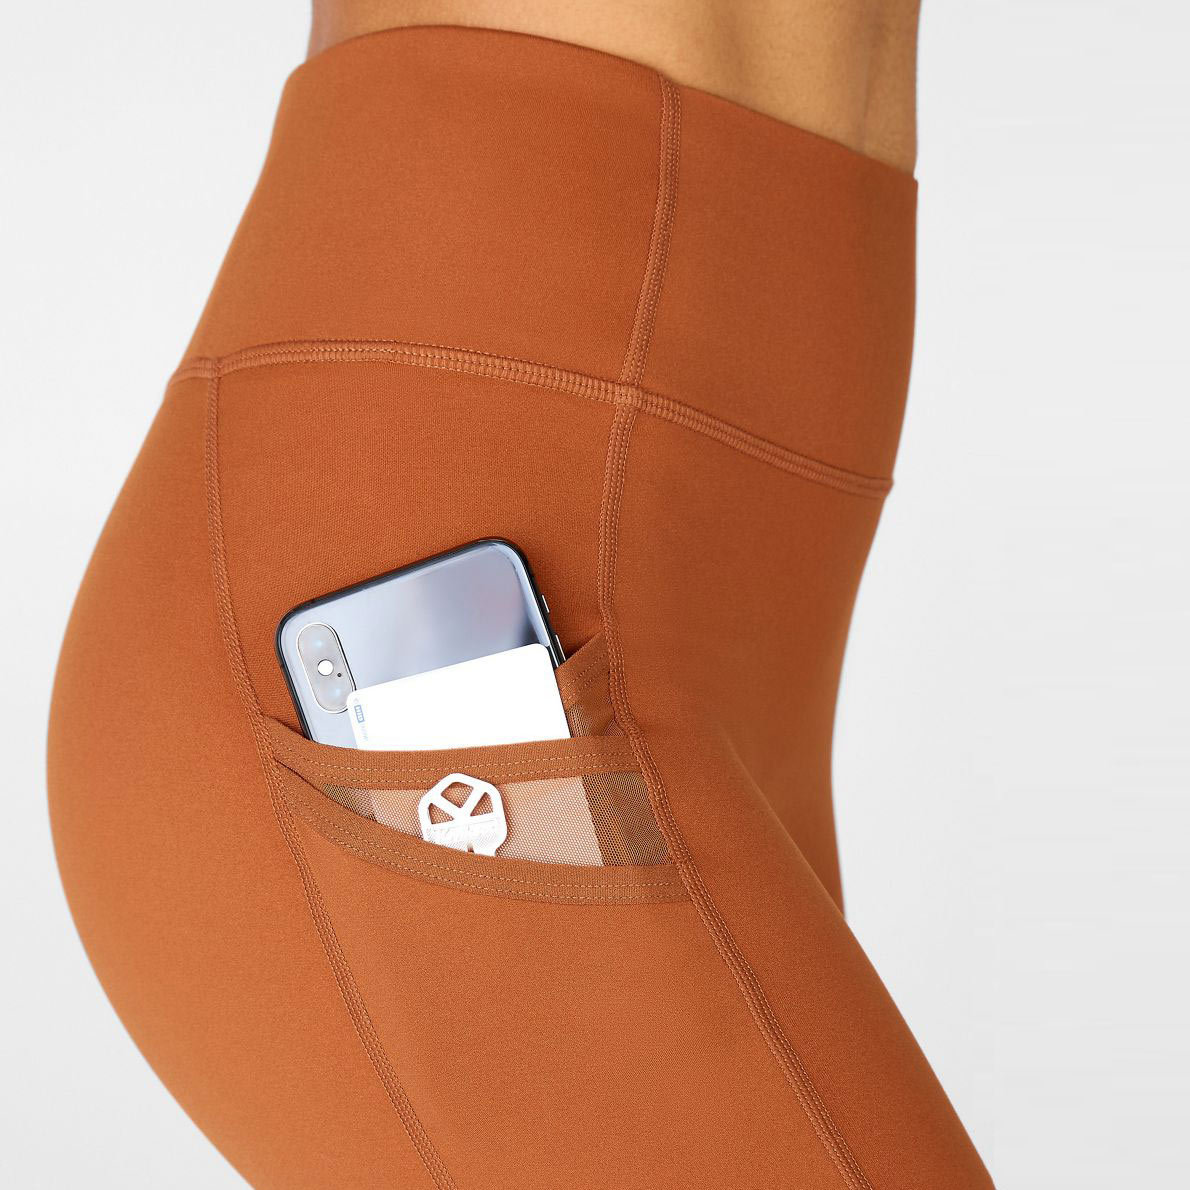 leggings with phone pocket